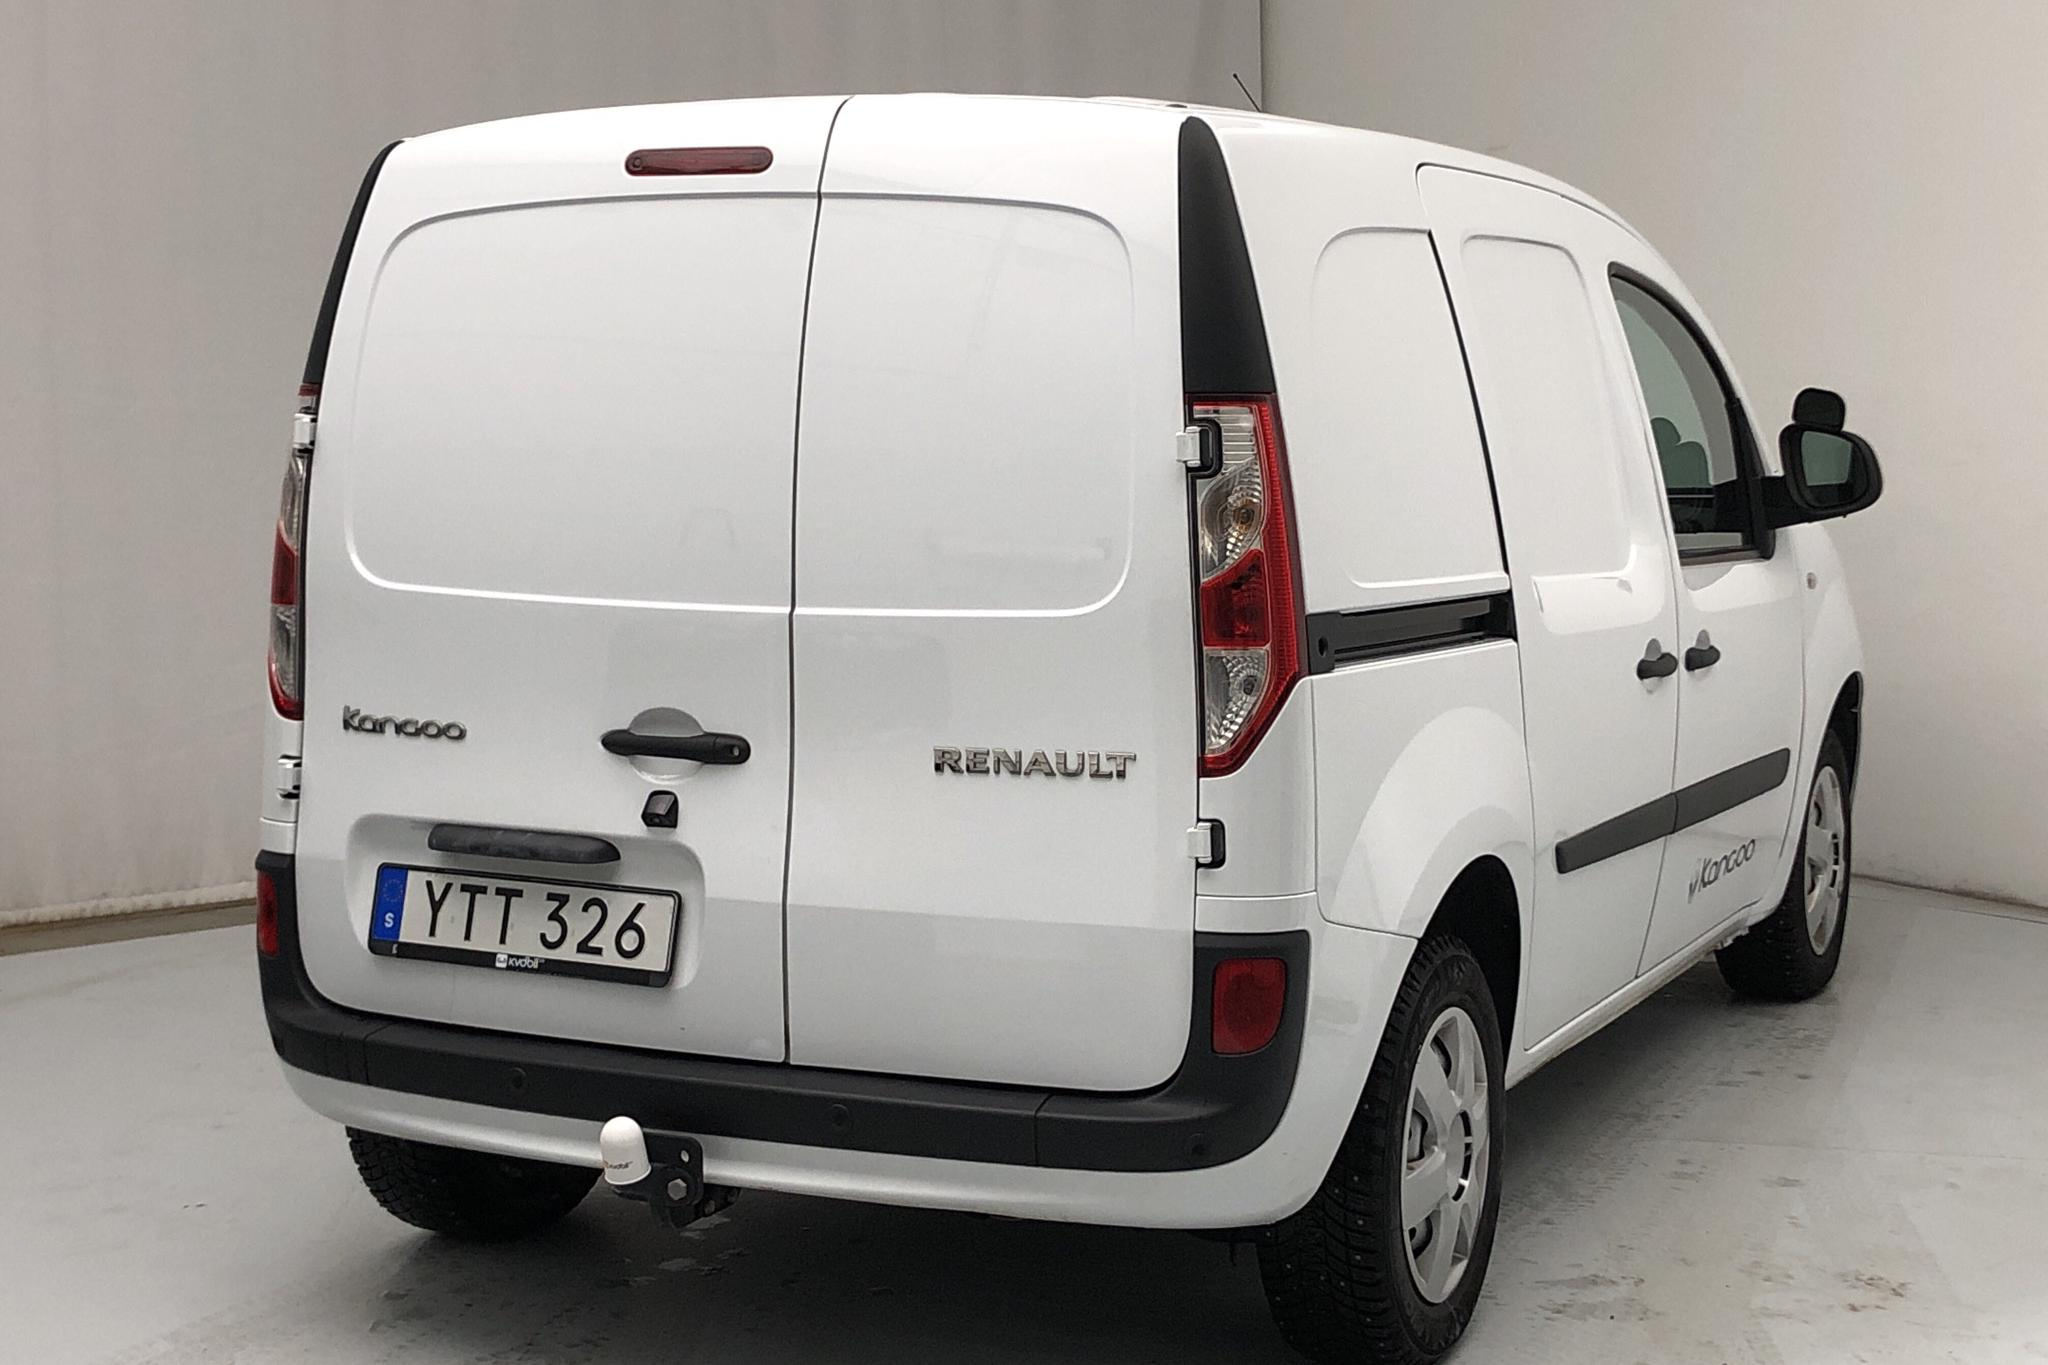 Renault Kangoo 1.5 dCi Skåp (75hk) - 2 034 mil - Manuell - vit - 2018